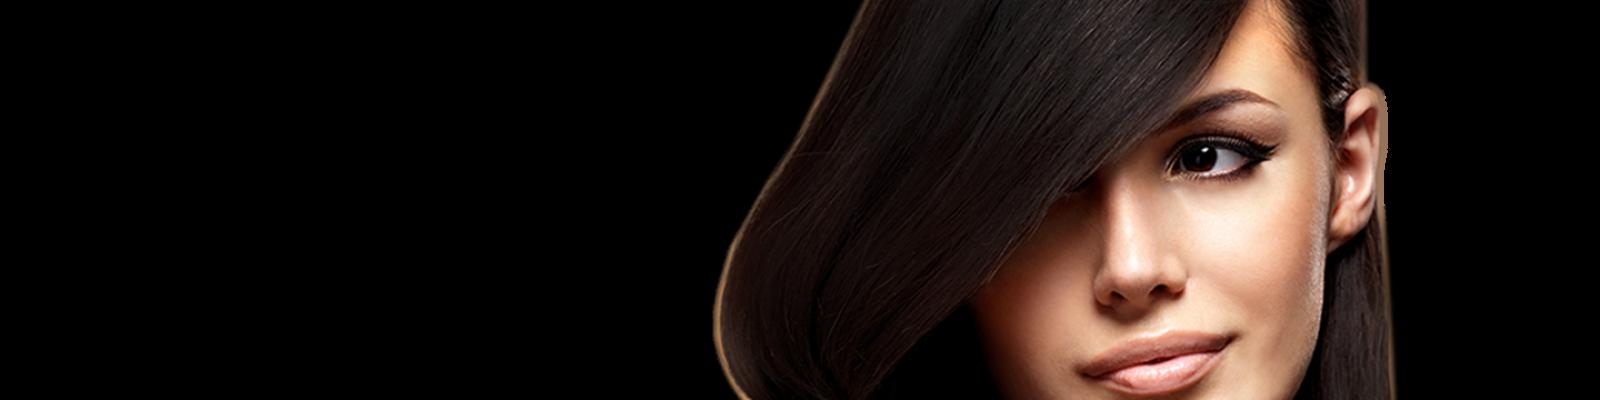 Strong Hair Formula Prevent Hair Loss